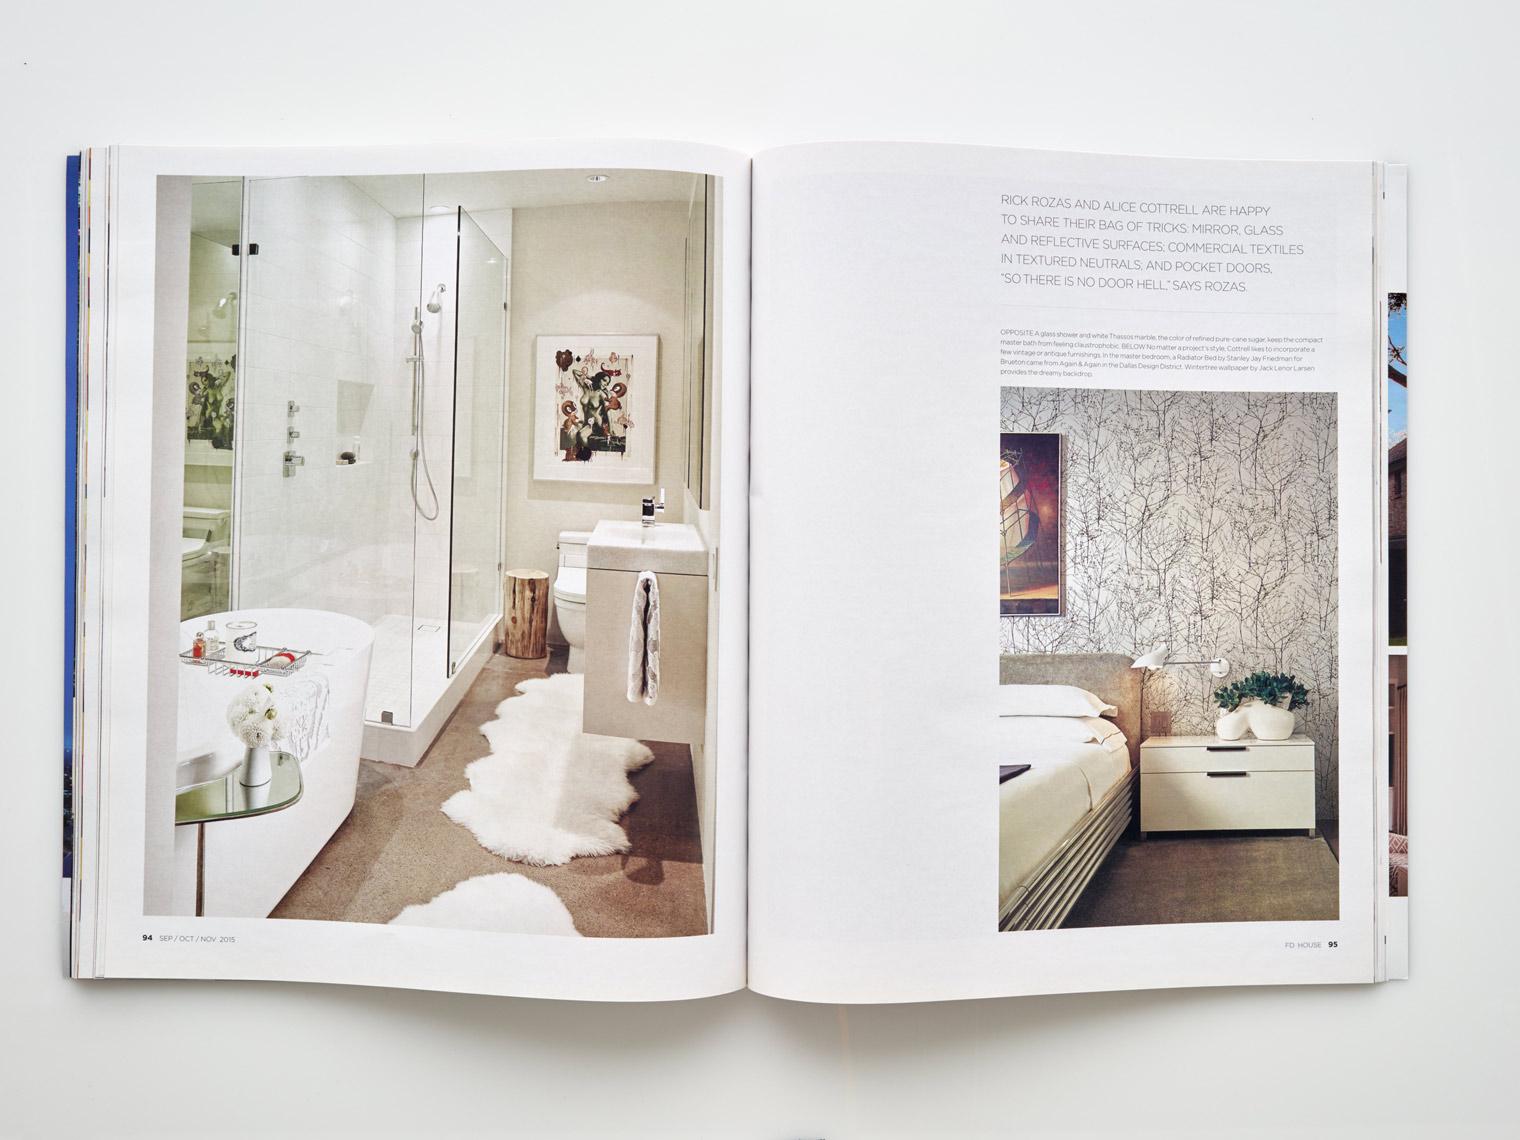 Stephen Karlisch FD House Turtle Creek High-Rise Bedroom Bath